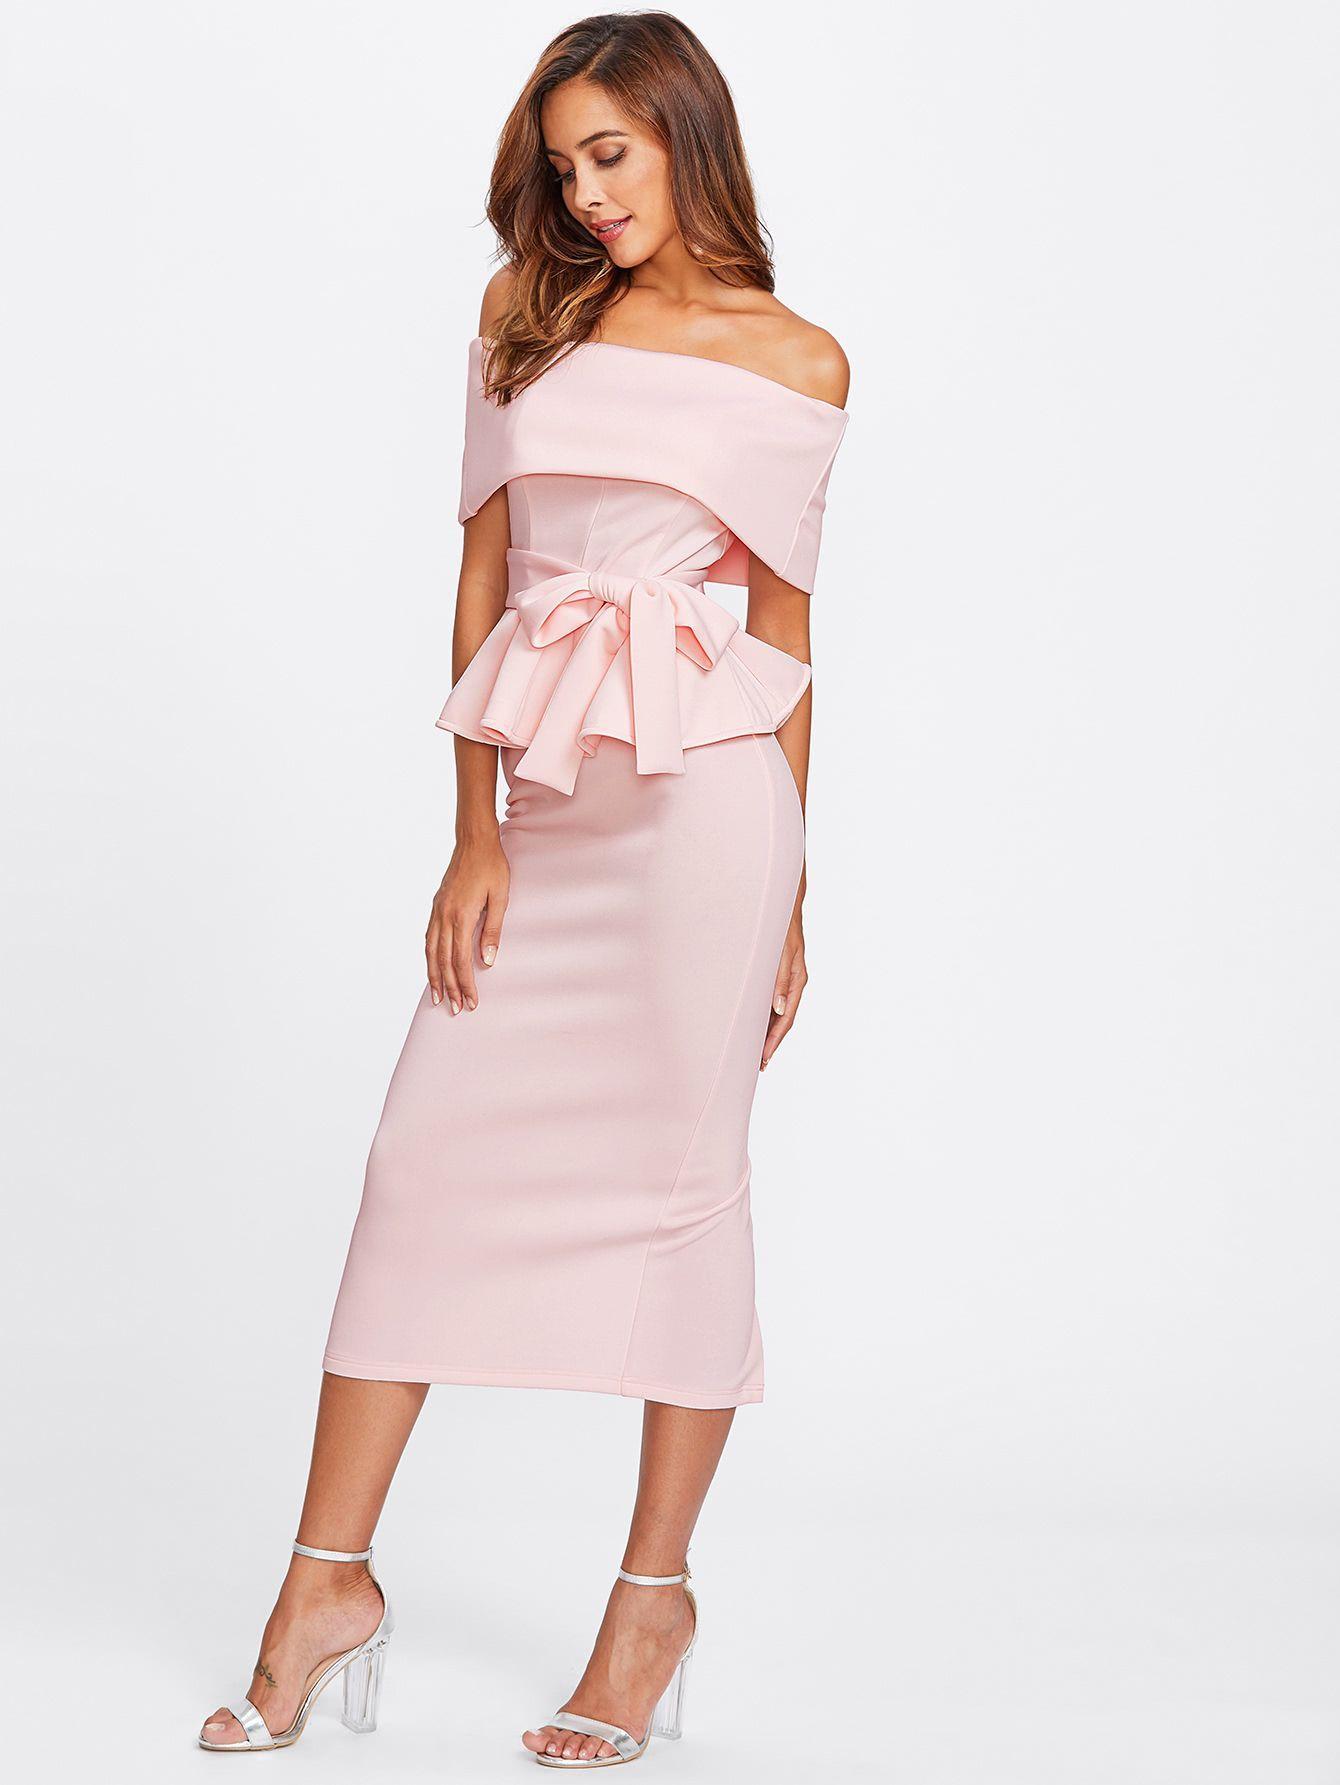 30629f2f3 Foldover Bardot Peplum Top & Skirt Set   MakeMeChic.COM   Make Me ...